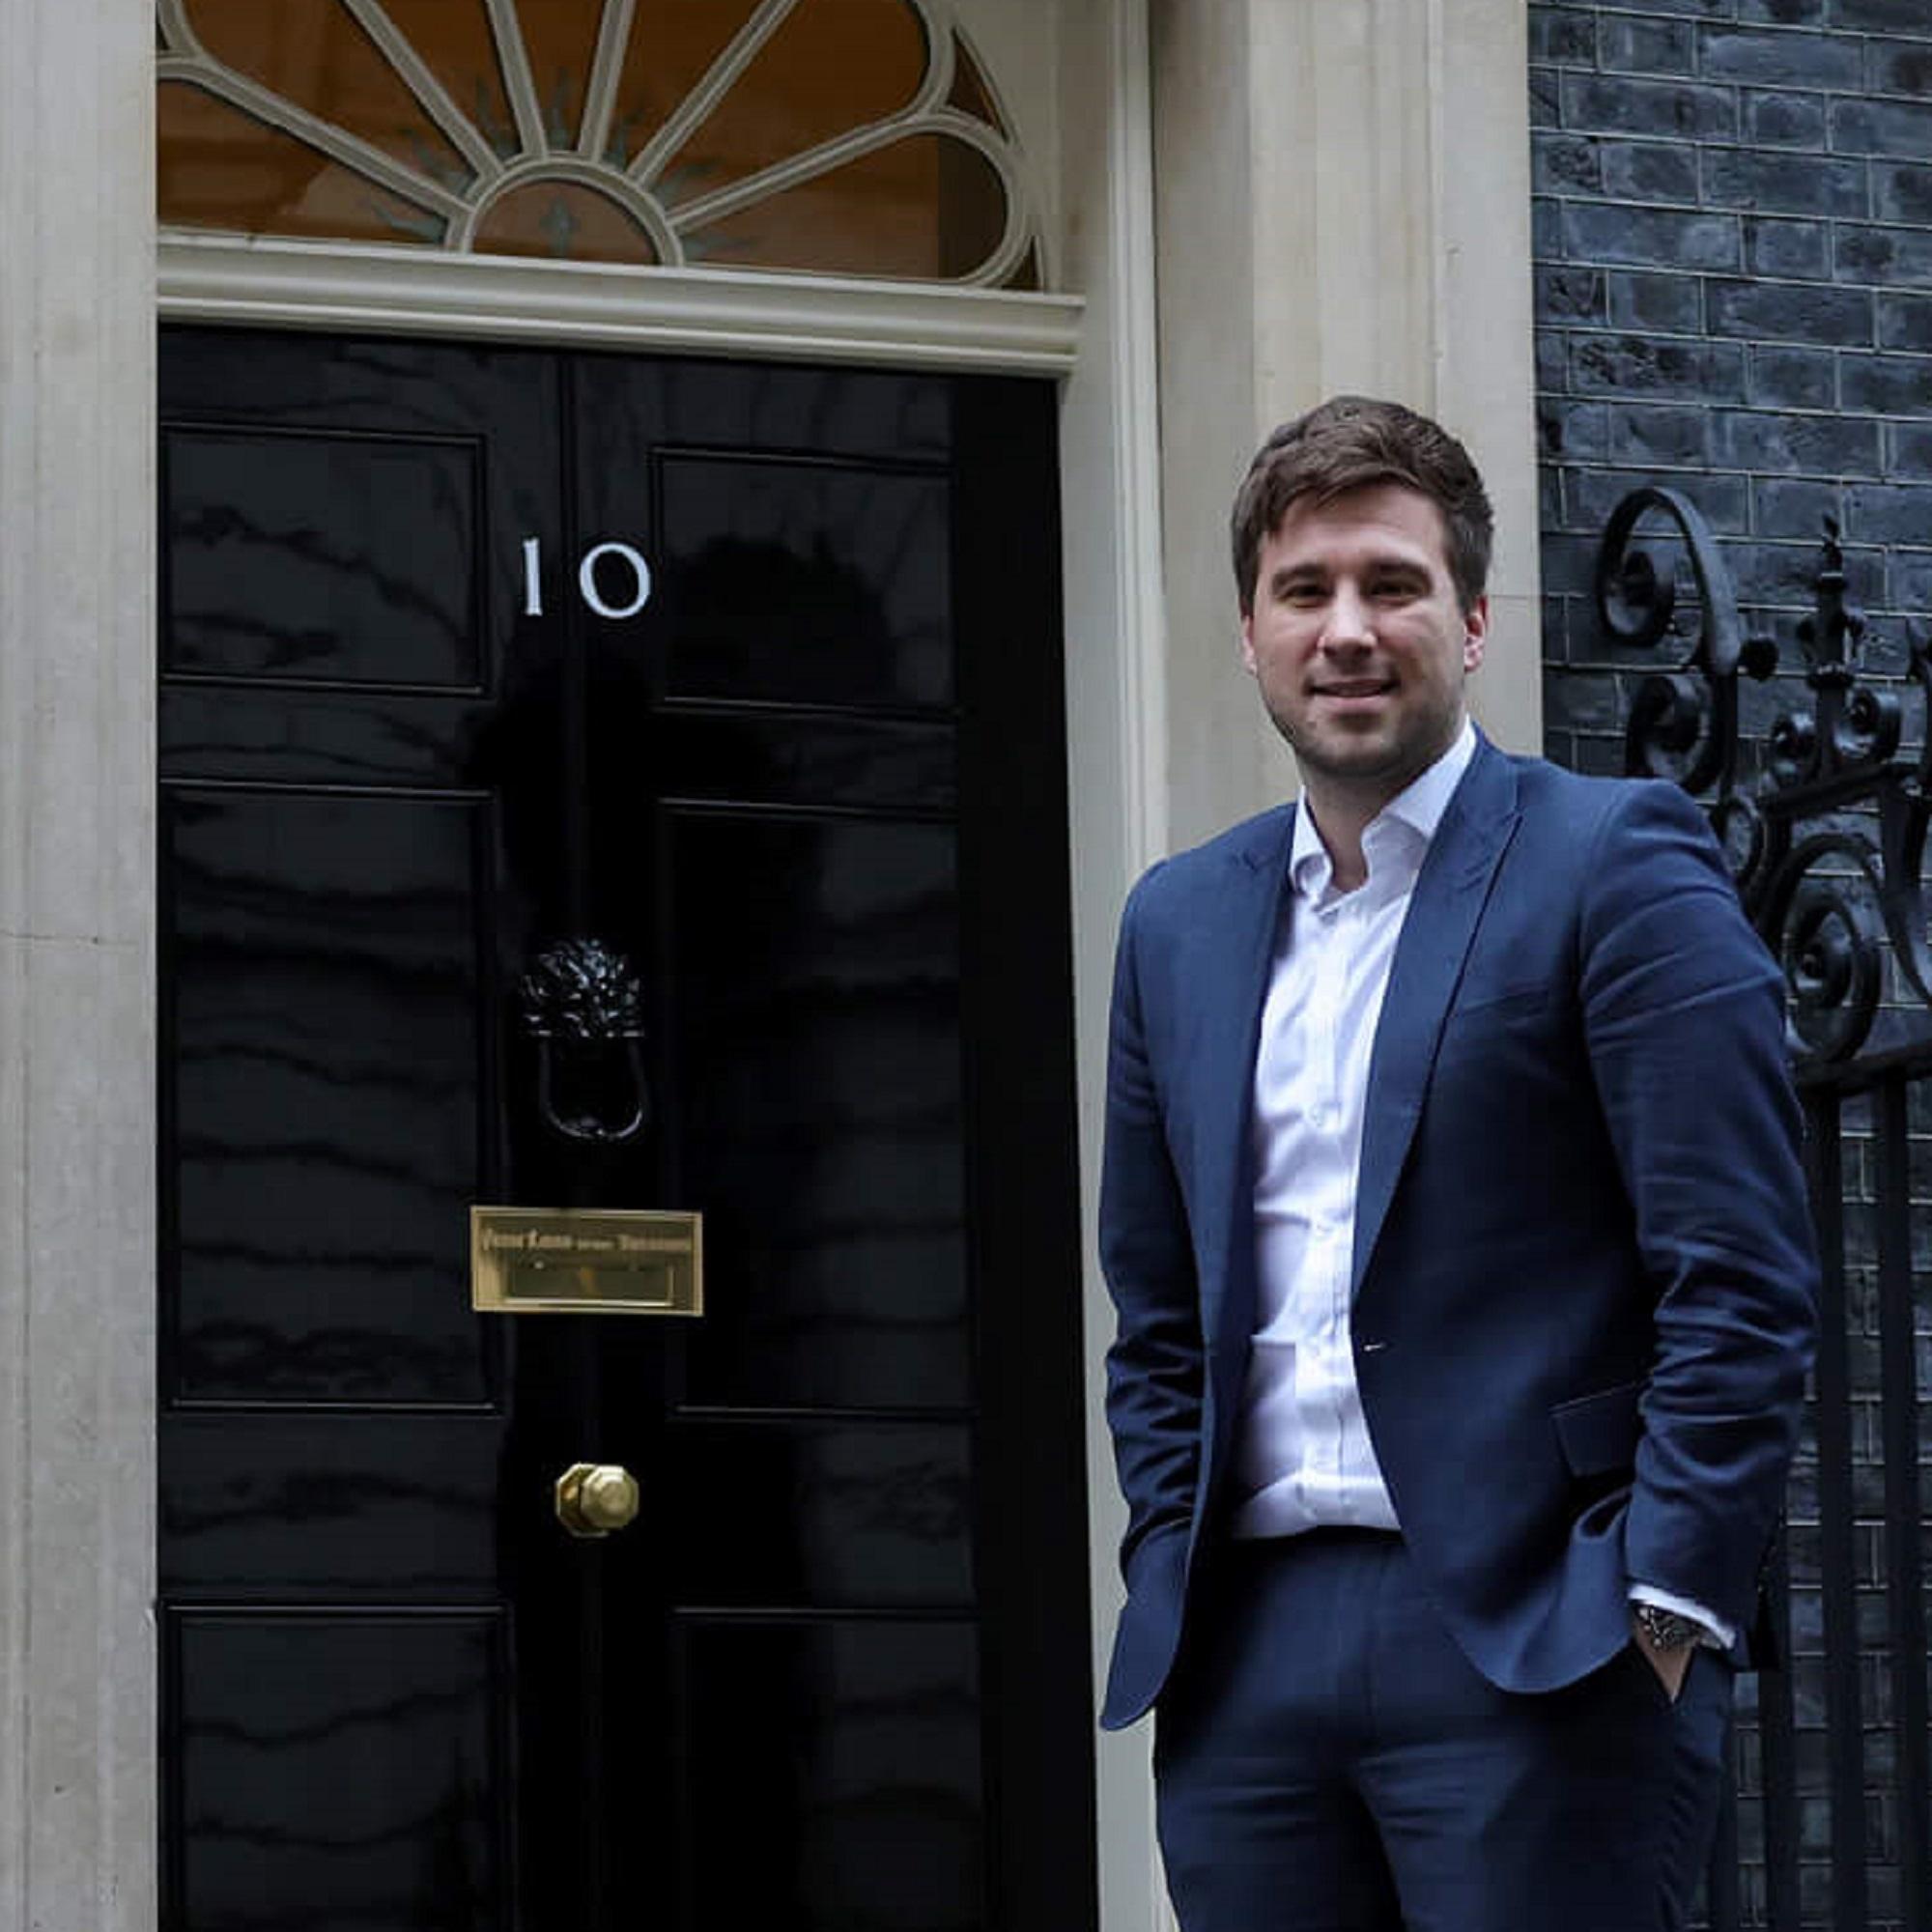 University of Derby graduate Shaun Jepson standing outside 10 Downing Street